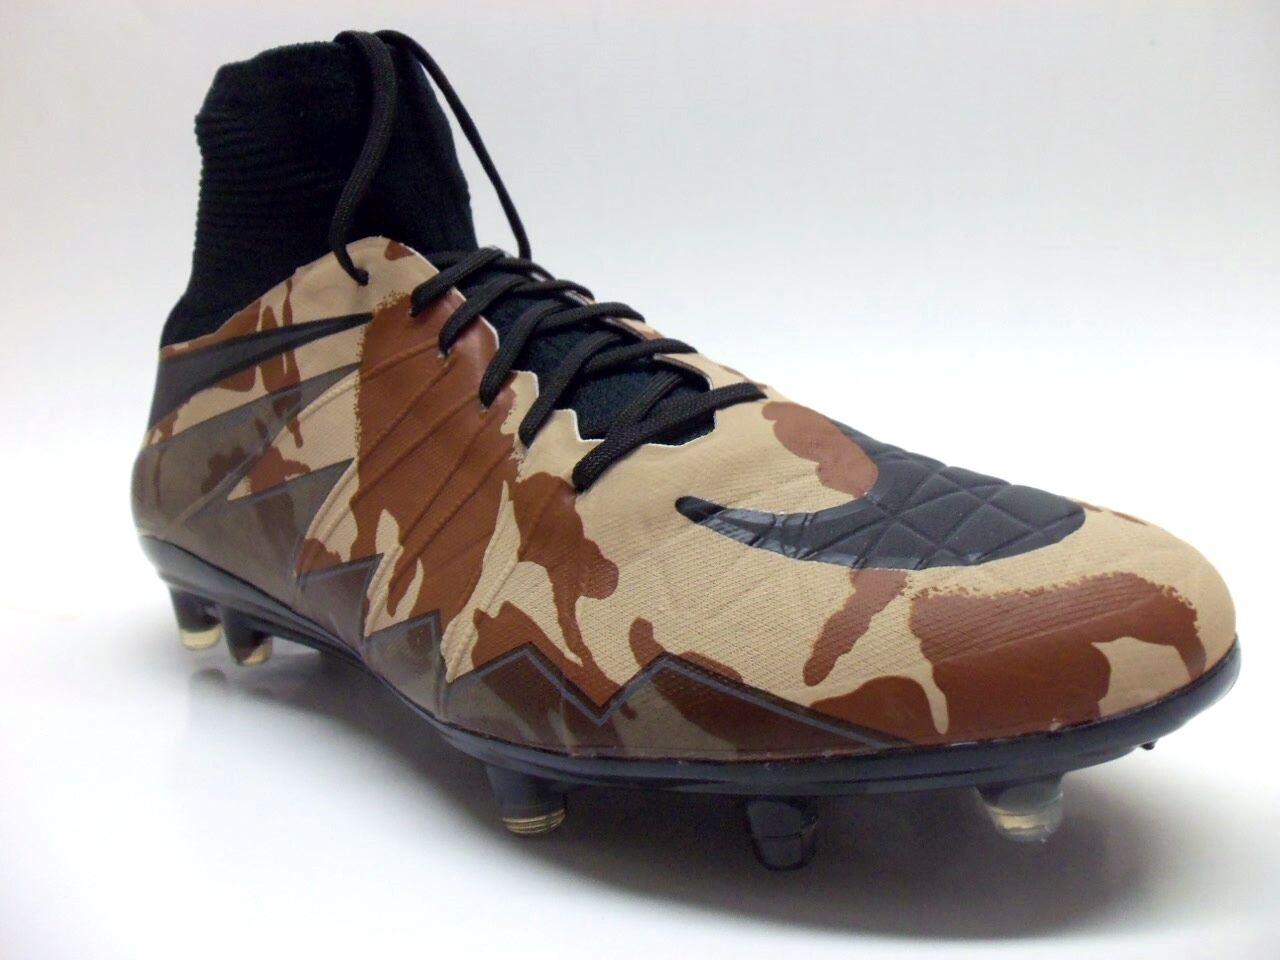 b443381e6dafae Nike Hypervenom Phantom II SE FG 835367-200 Camo Soccer Cleats Sz 11 ...